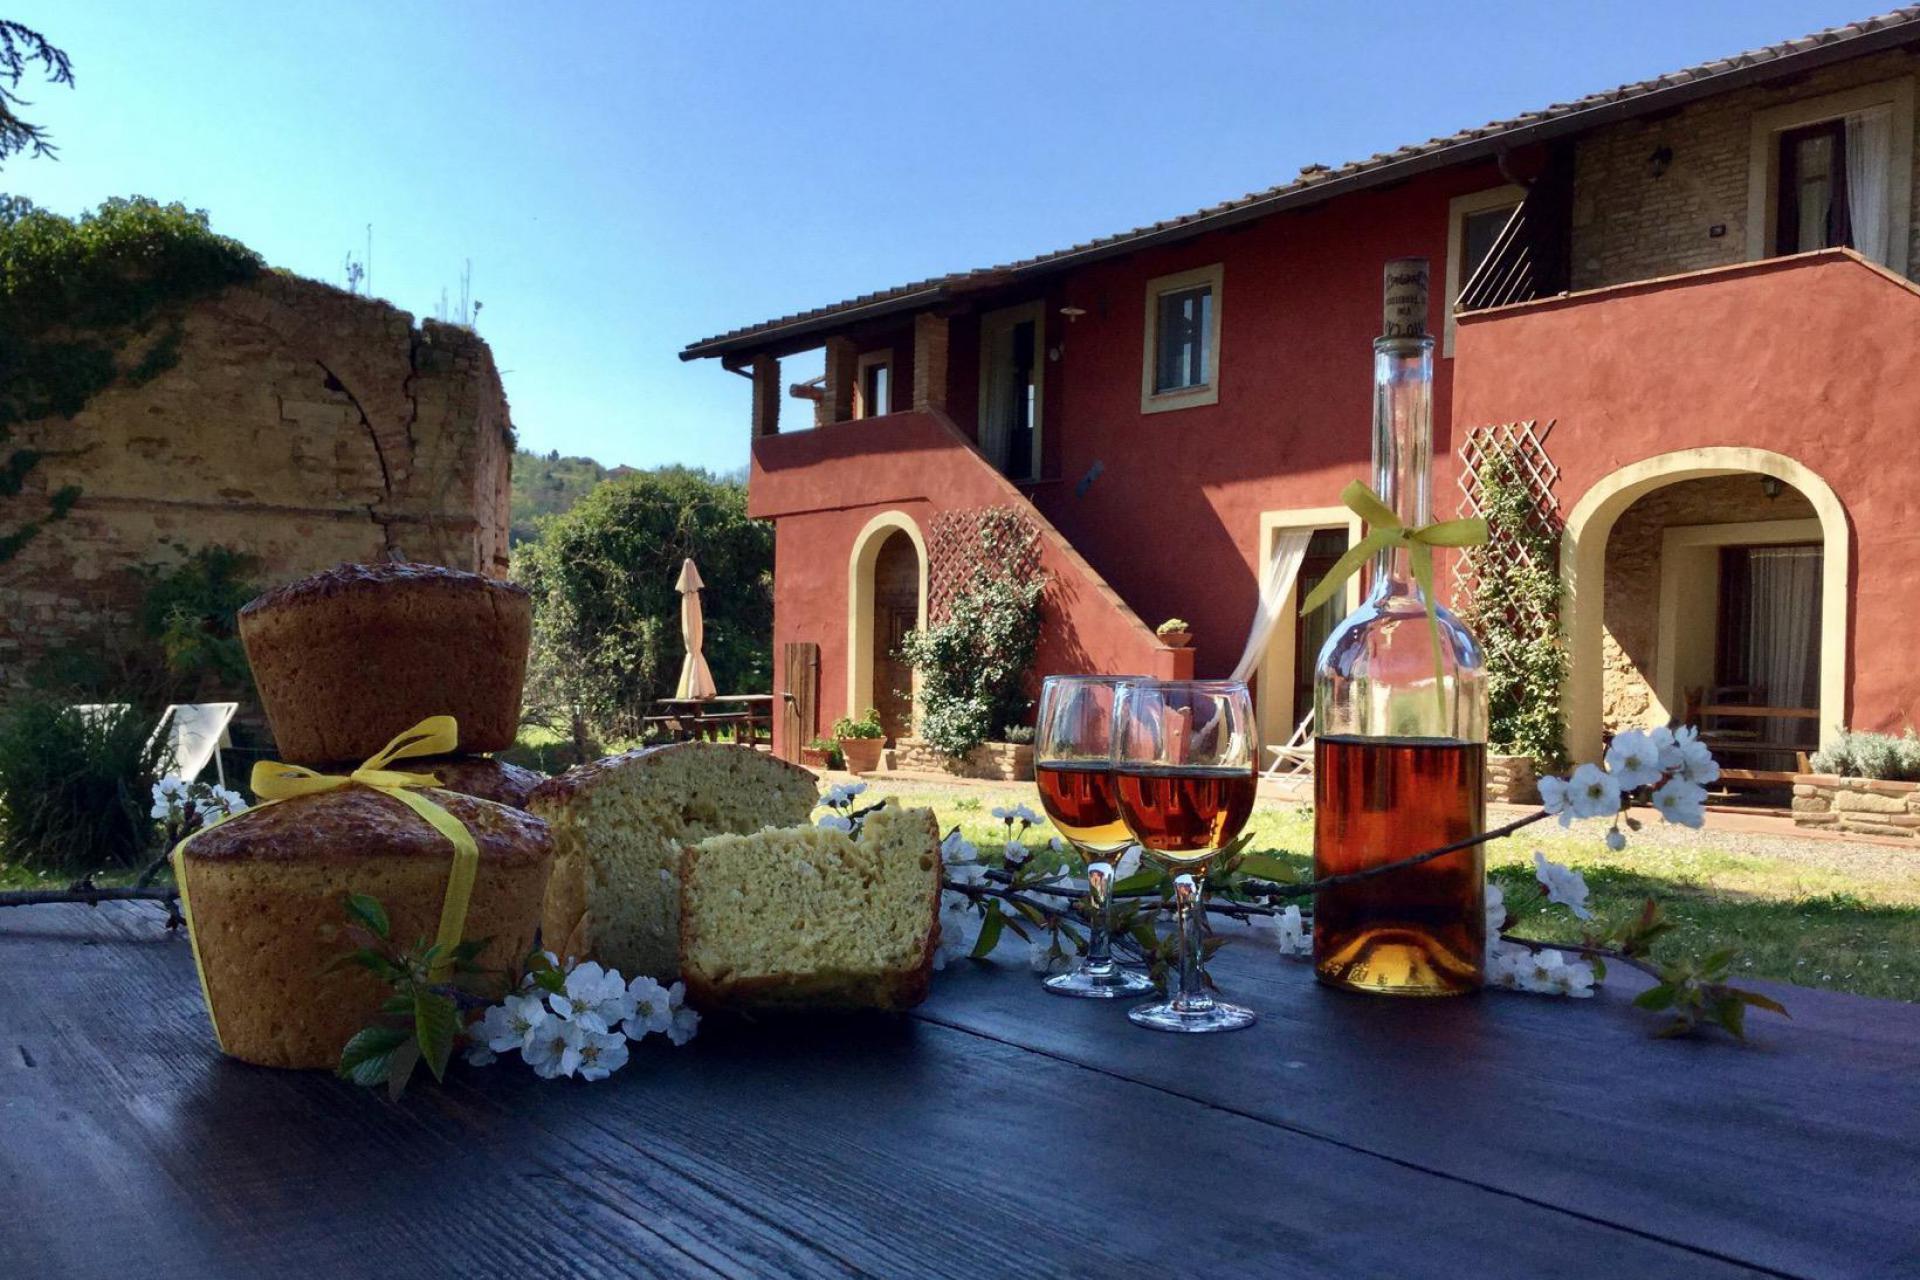 Agriturismo Toscane Erg leuke agriturismo in Toscane met restaurant